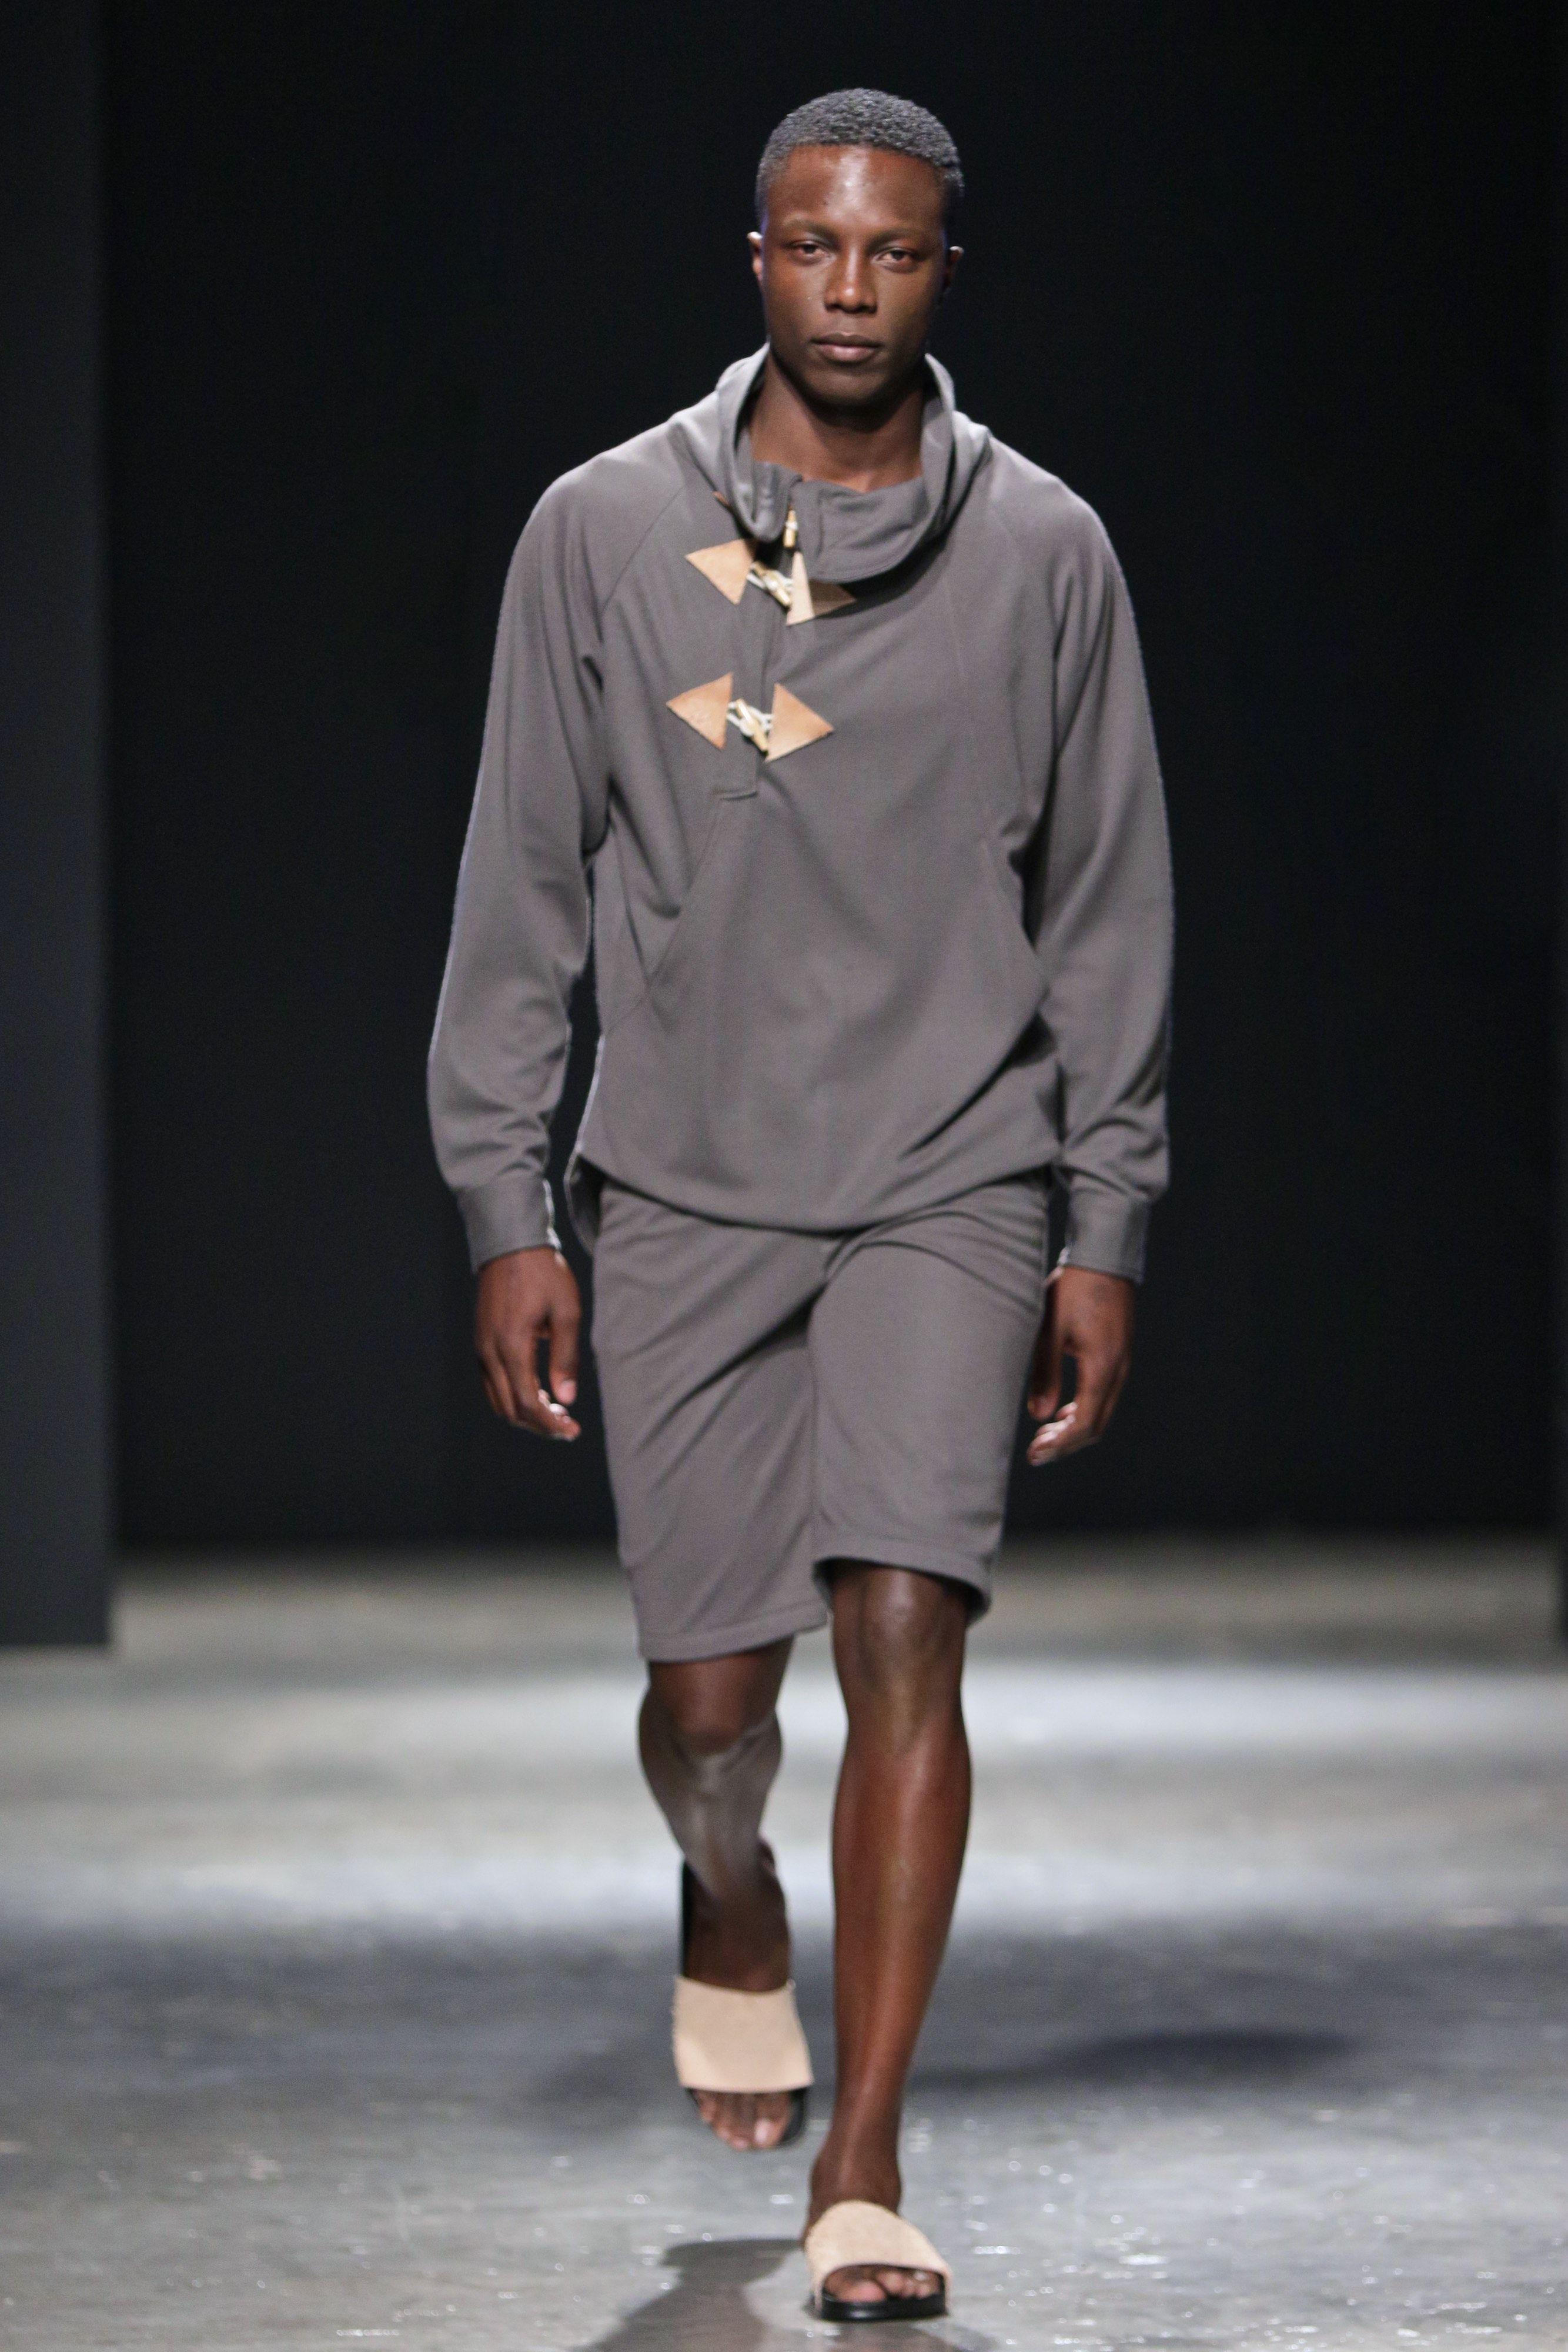 Merwe Mode South Africa Menswear Week - #Trends #Tendencias #Moda Hombre - SDR Photo